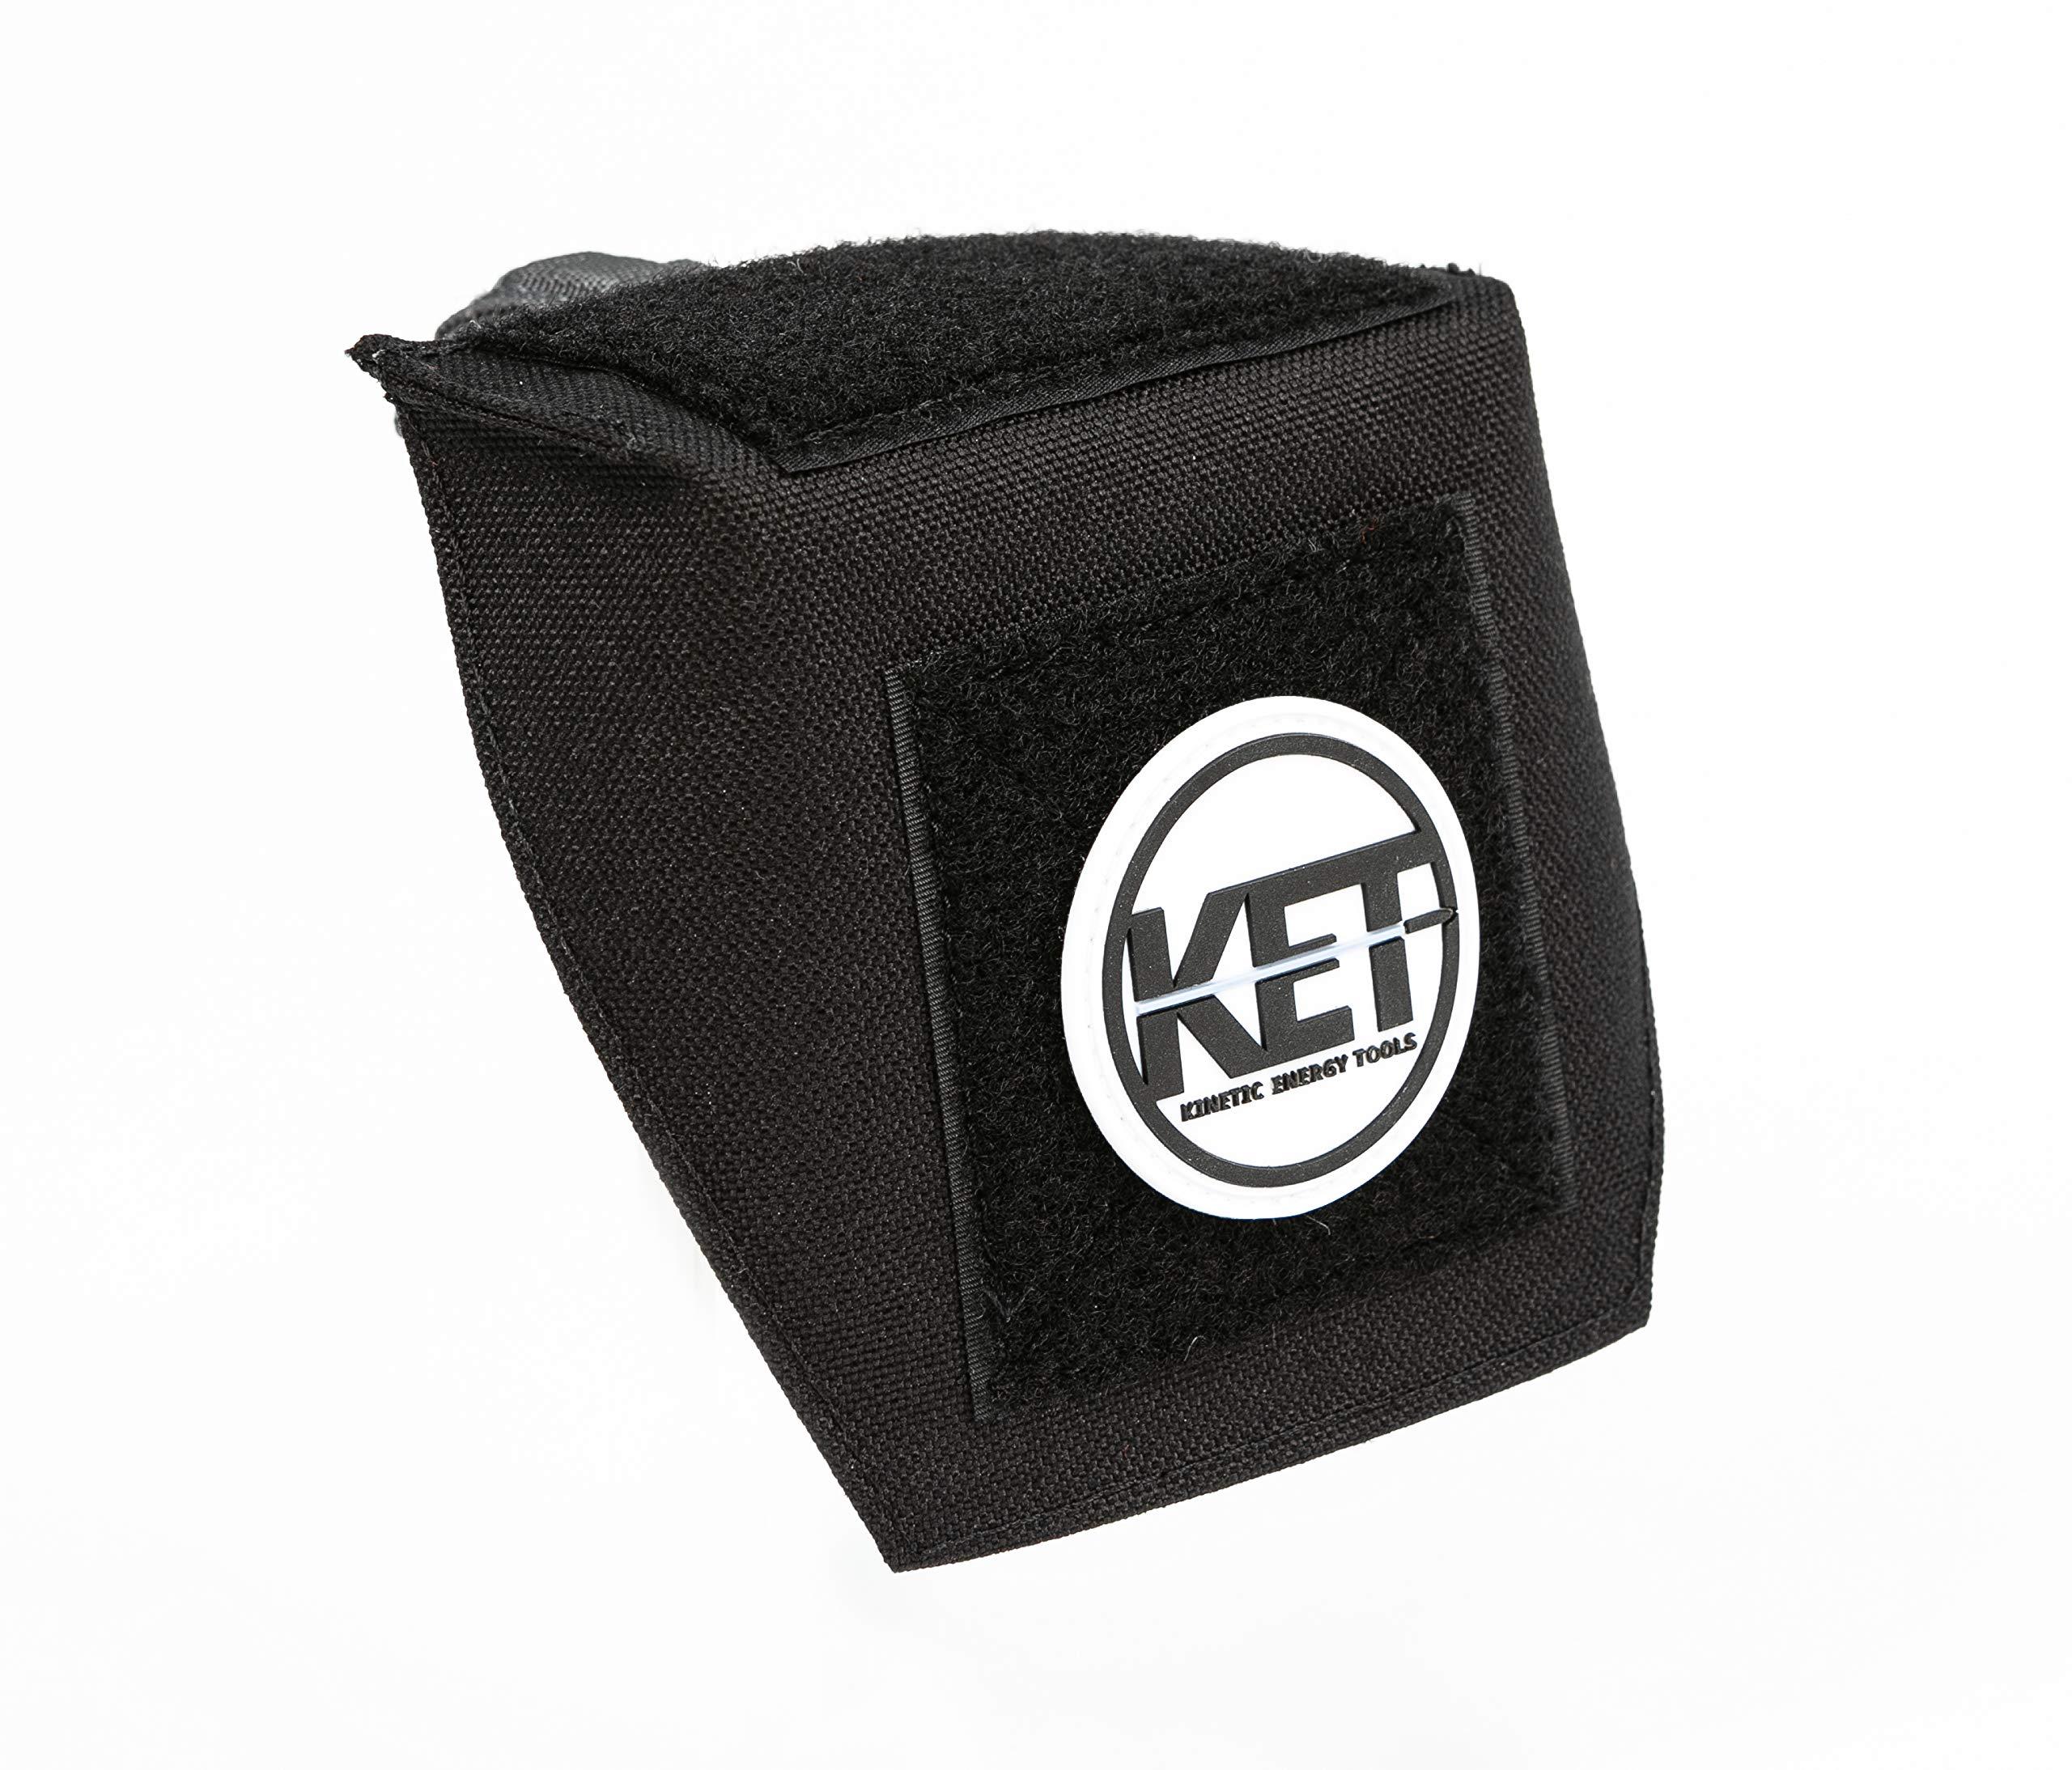 KET Brass Deflector: Brass Catcher Alternative - Scope & Pic Rail Mounts Included by KET